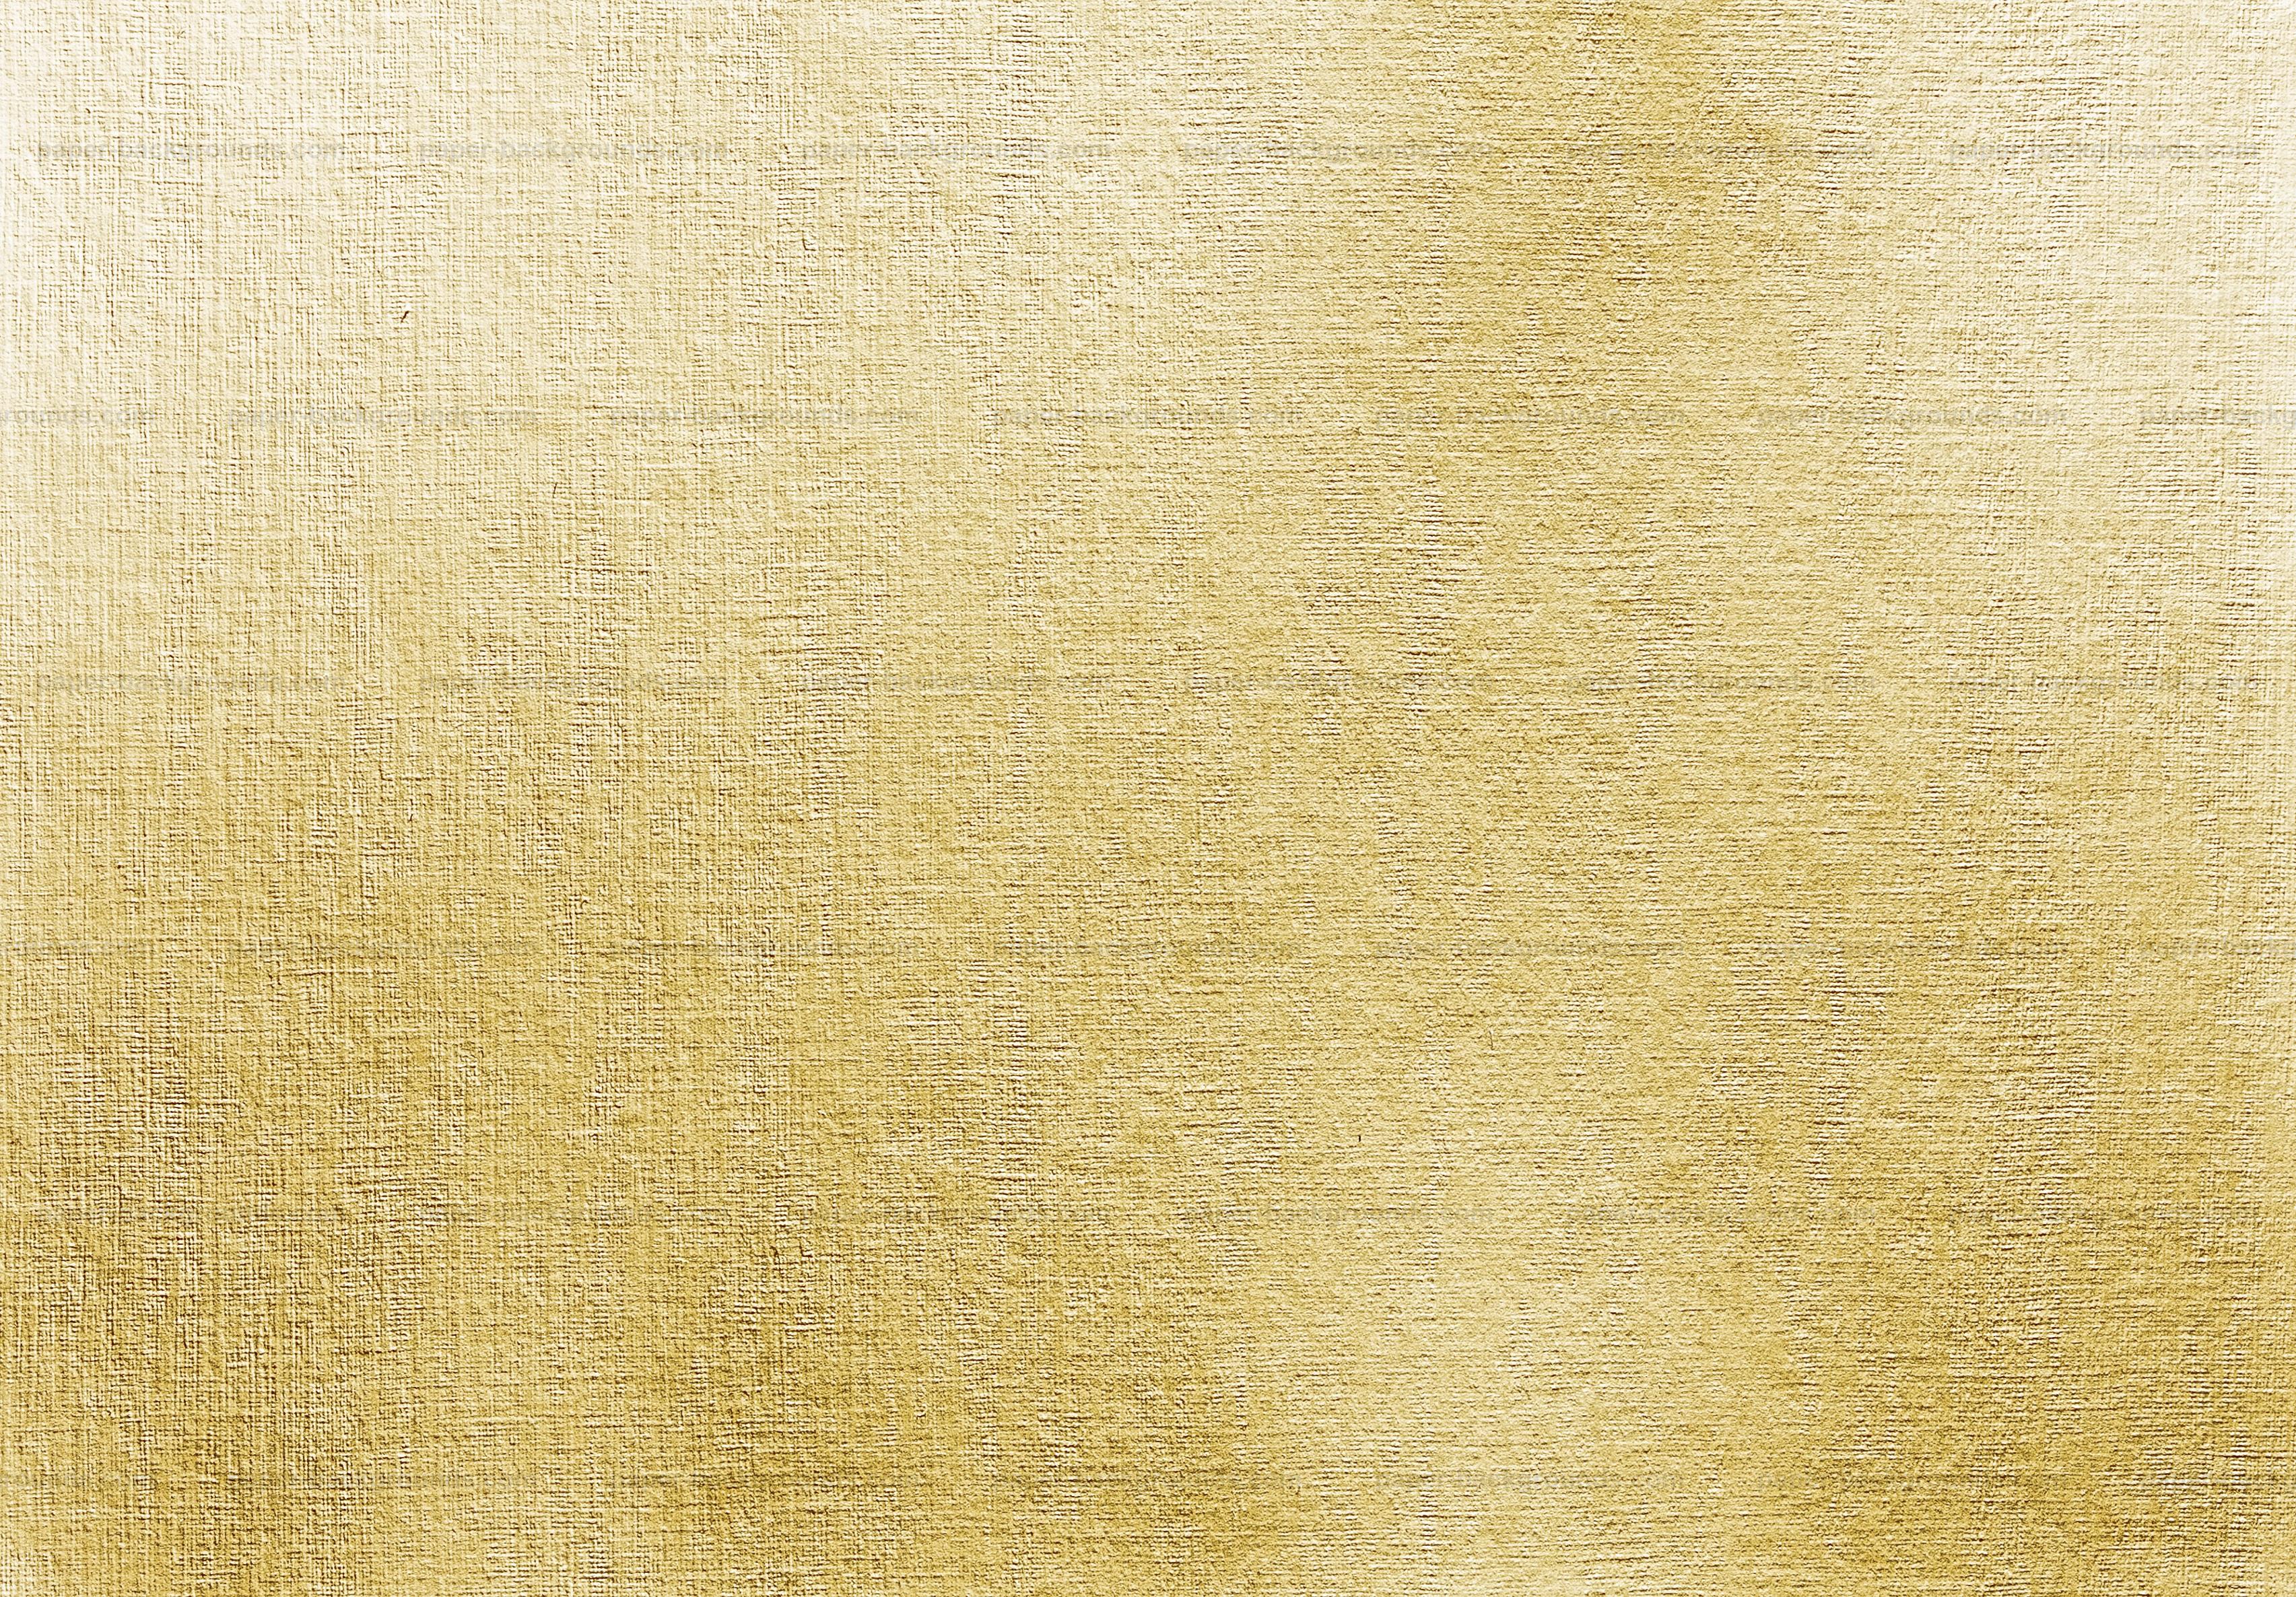 Paper Backgrounds Grunge Natural Texture Paper Background Vintage 3410x2372